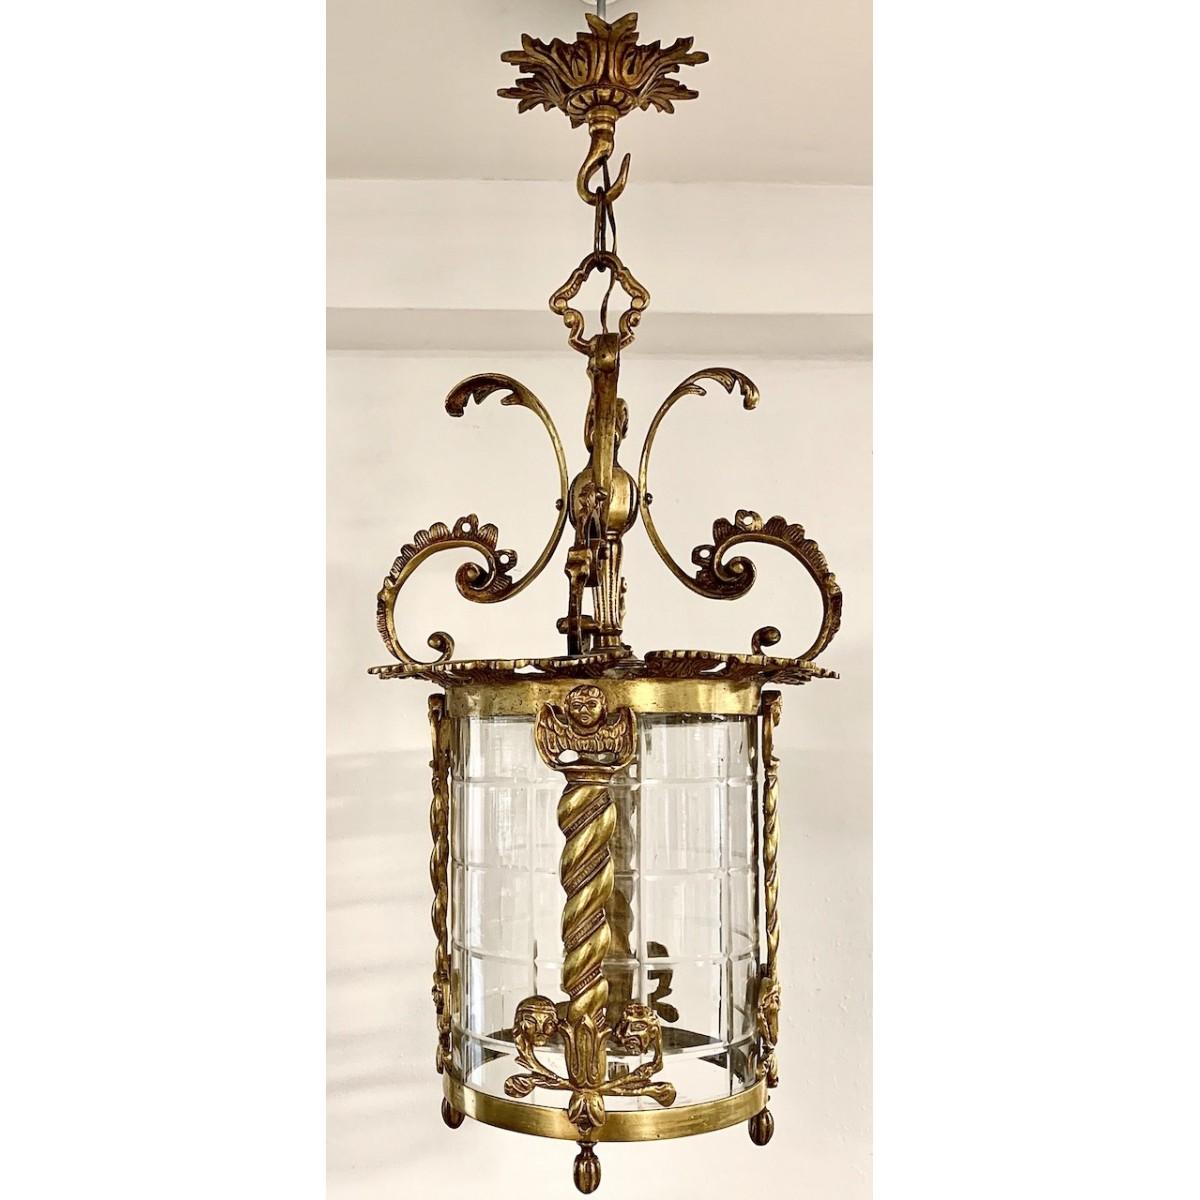 Cylindrical lantern ceiling lamp